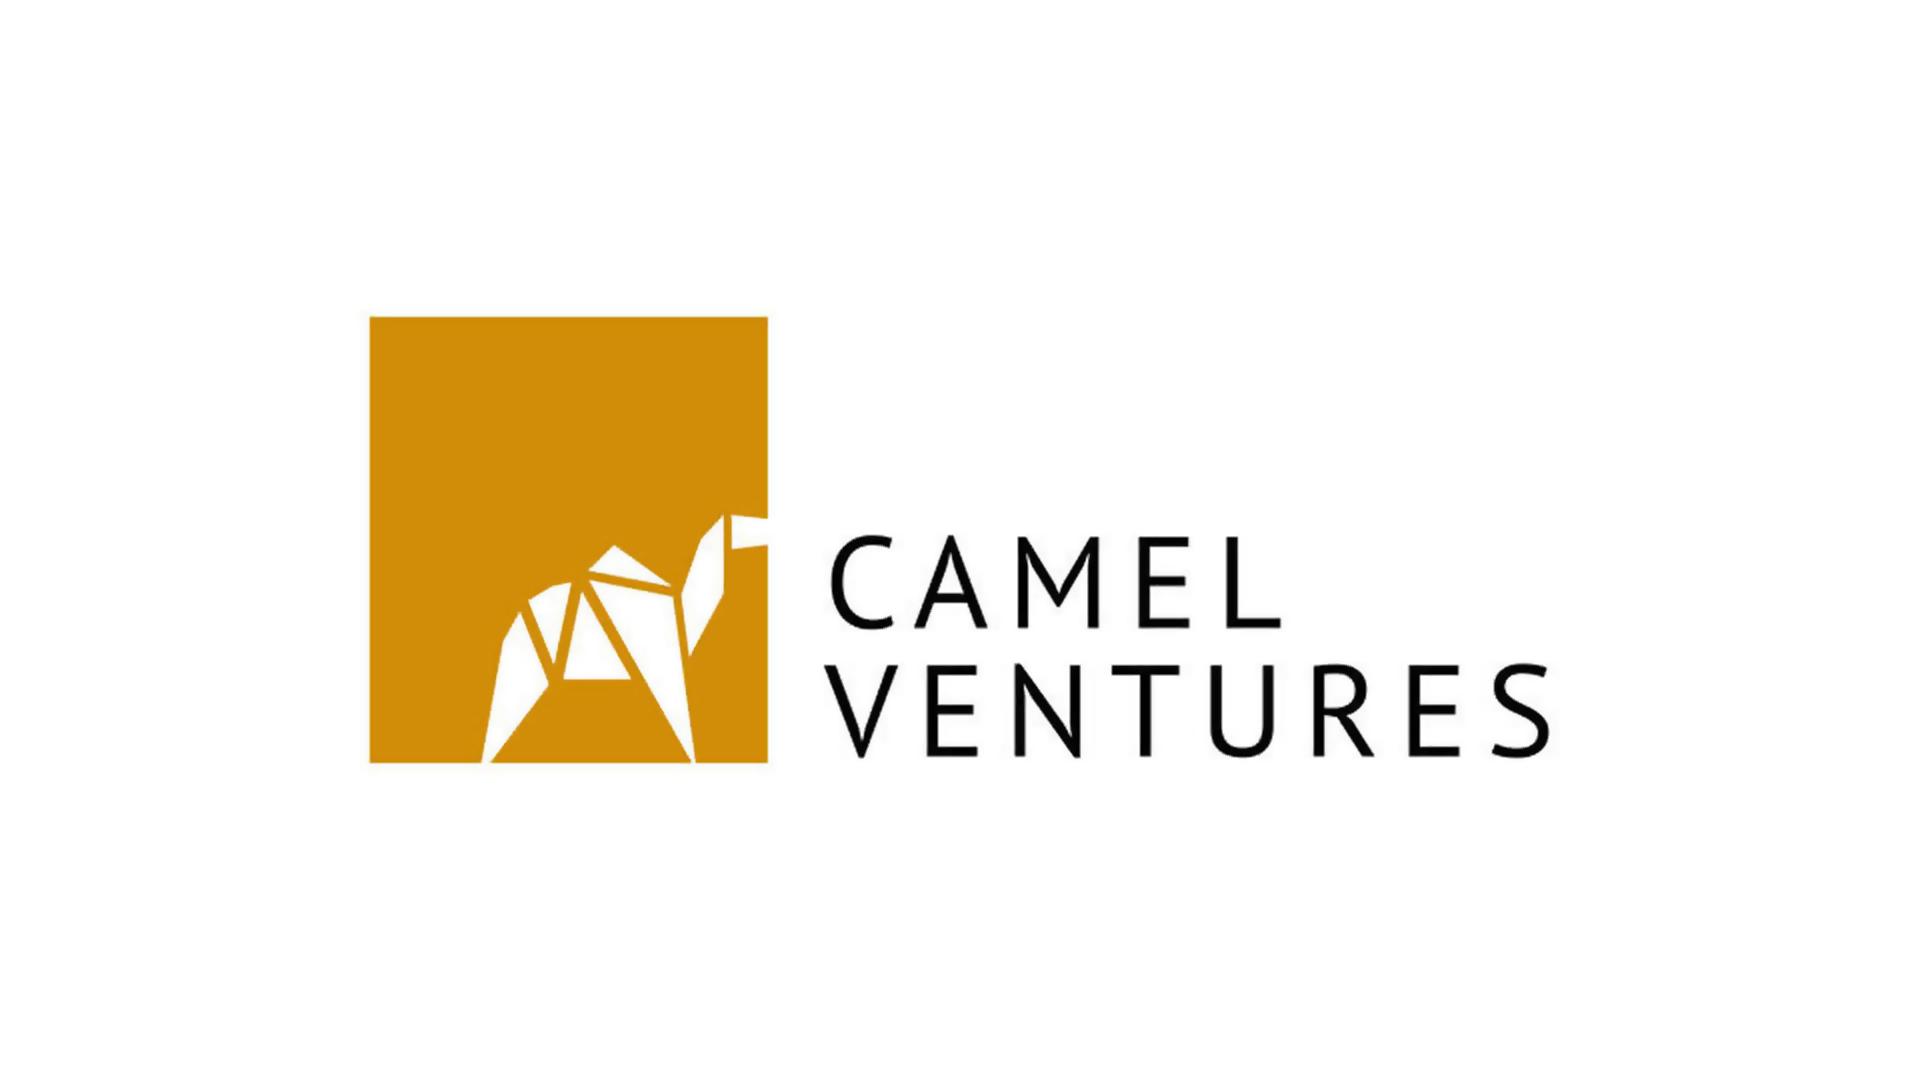 Camel Ventures Logo